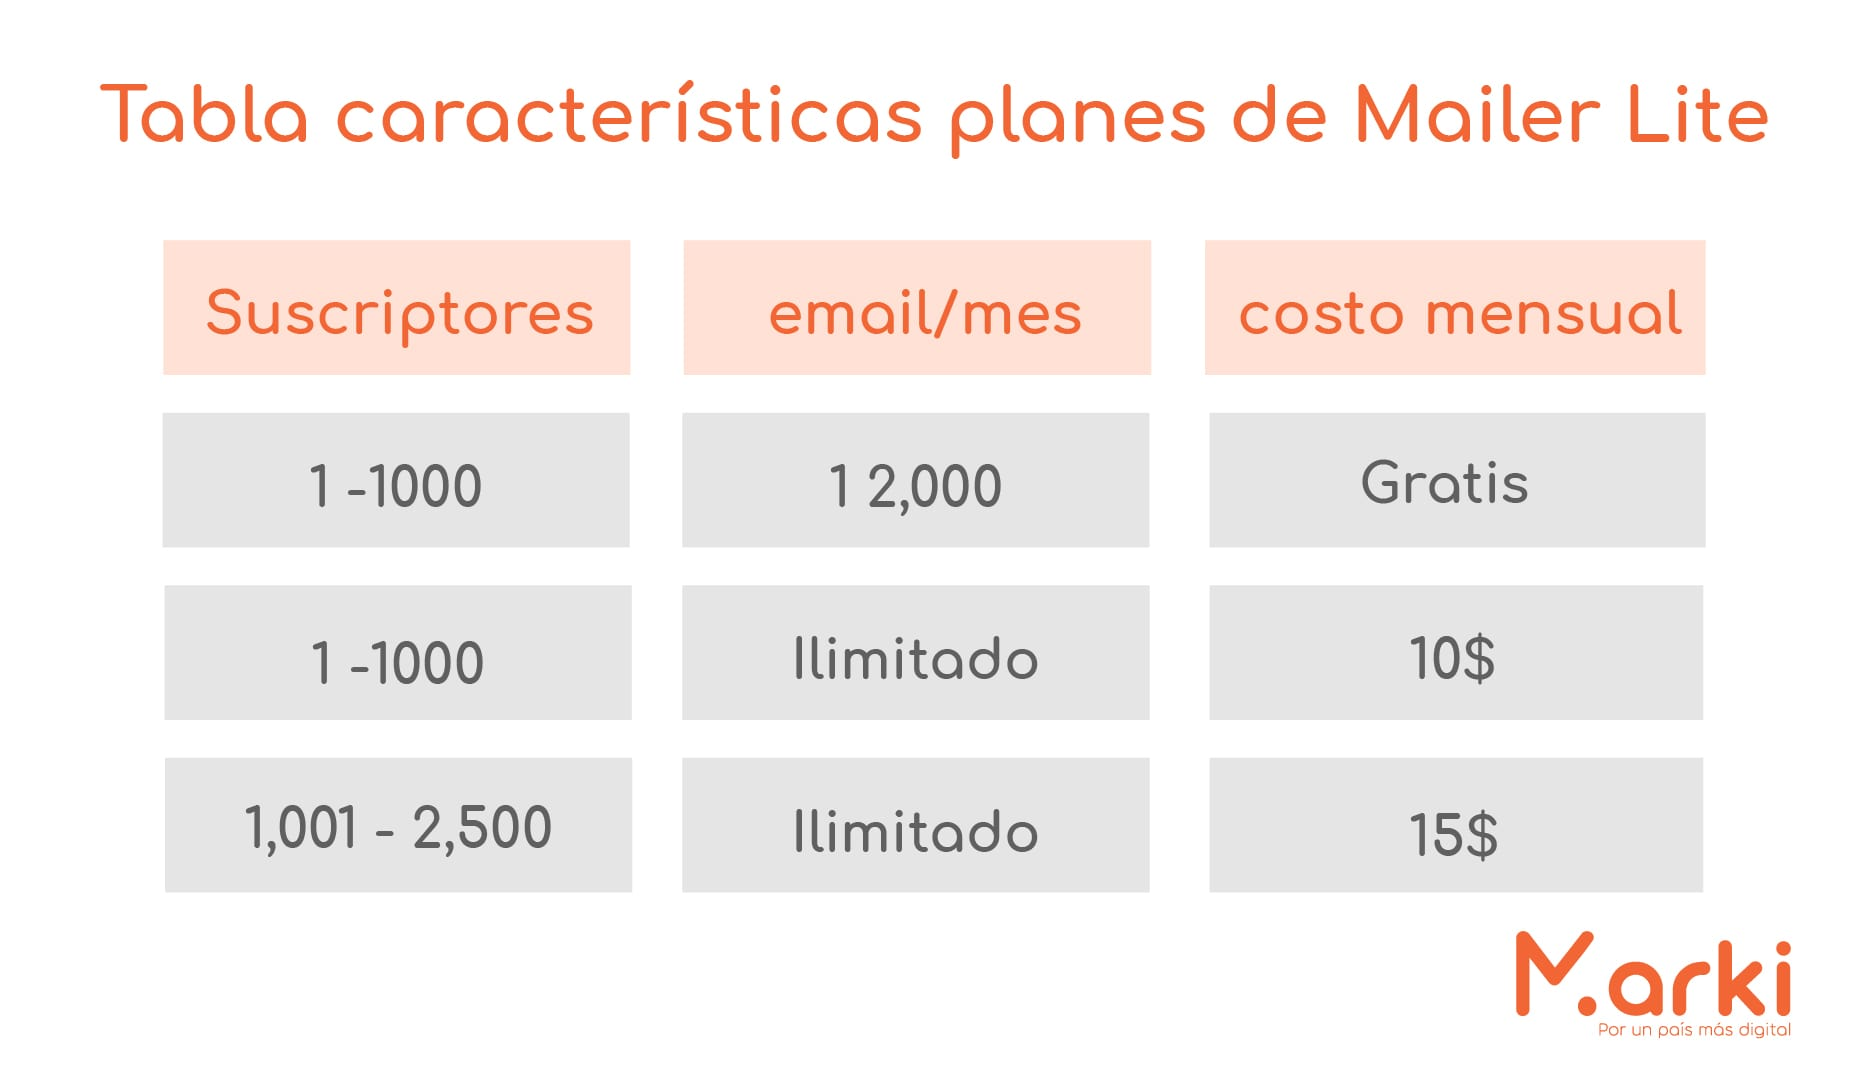 mailer lite planer mailer lite como hacer email marketing gratis campañas de mailing estrategias de email marketing ¿Cúal es la mejor herramienta de email marketing? diseño marki voluntariado marki